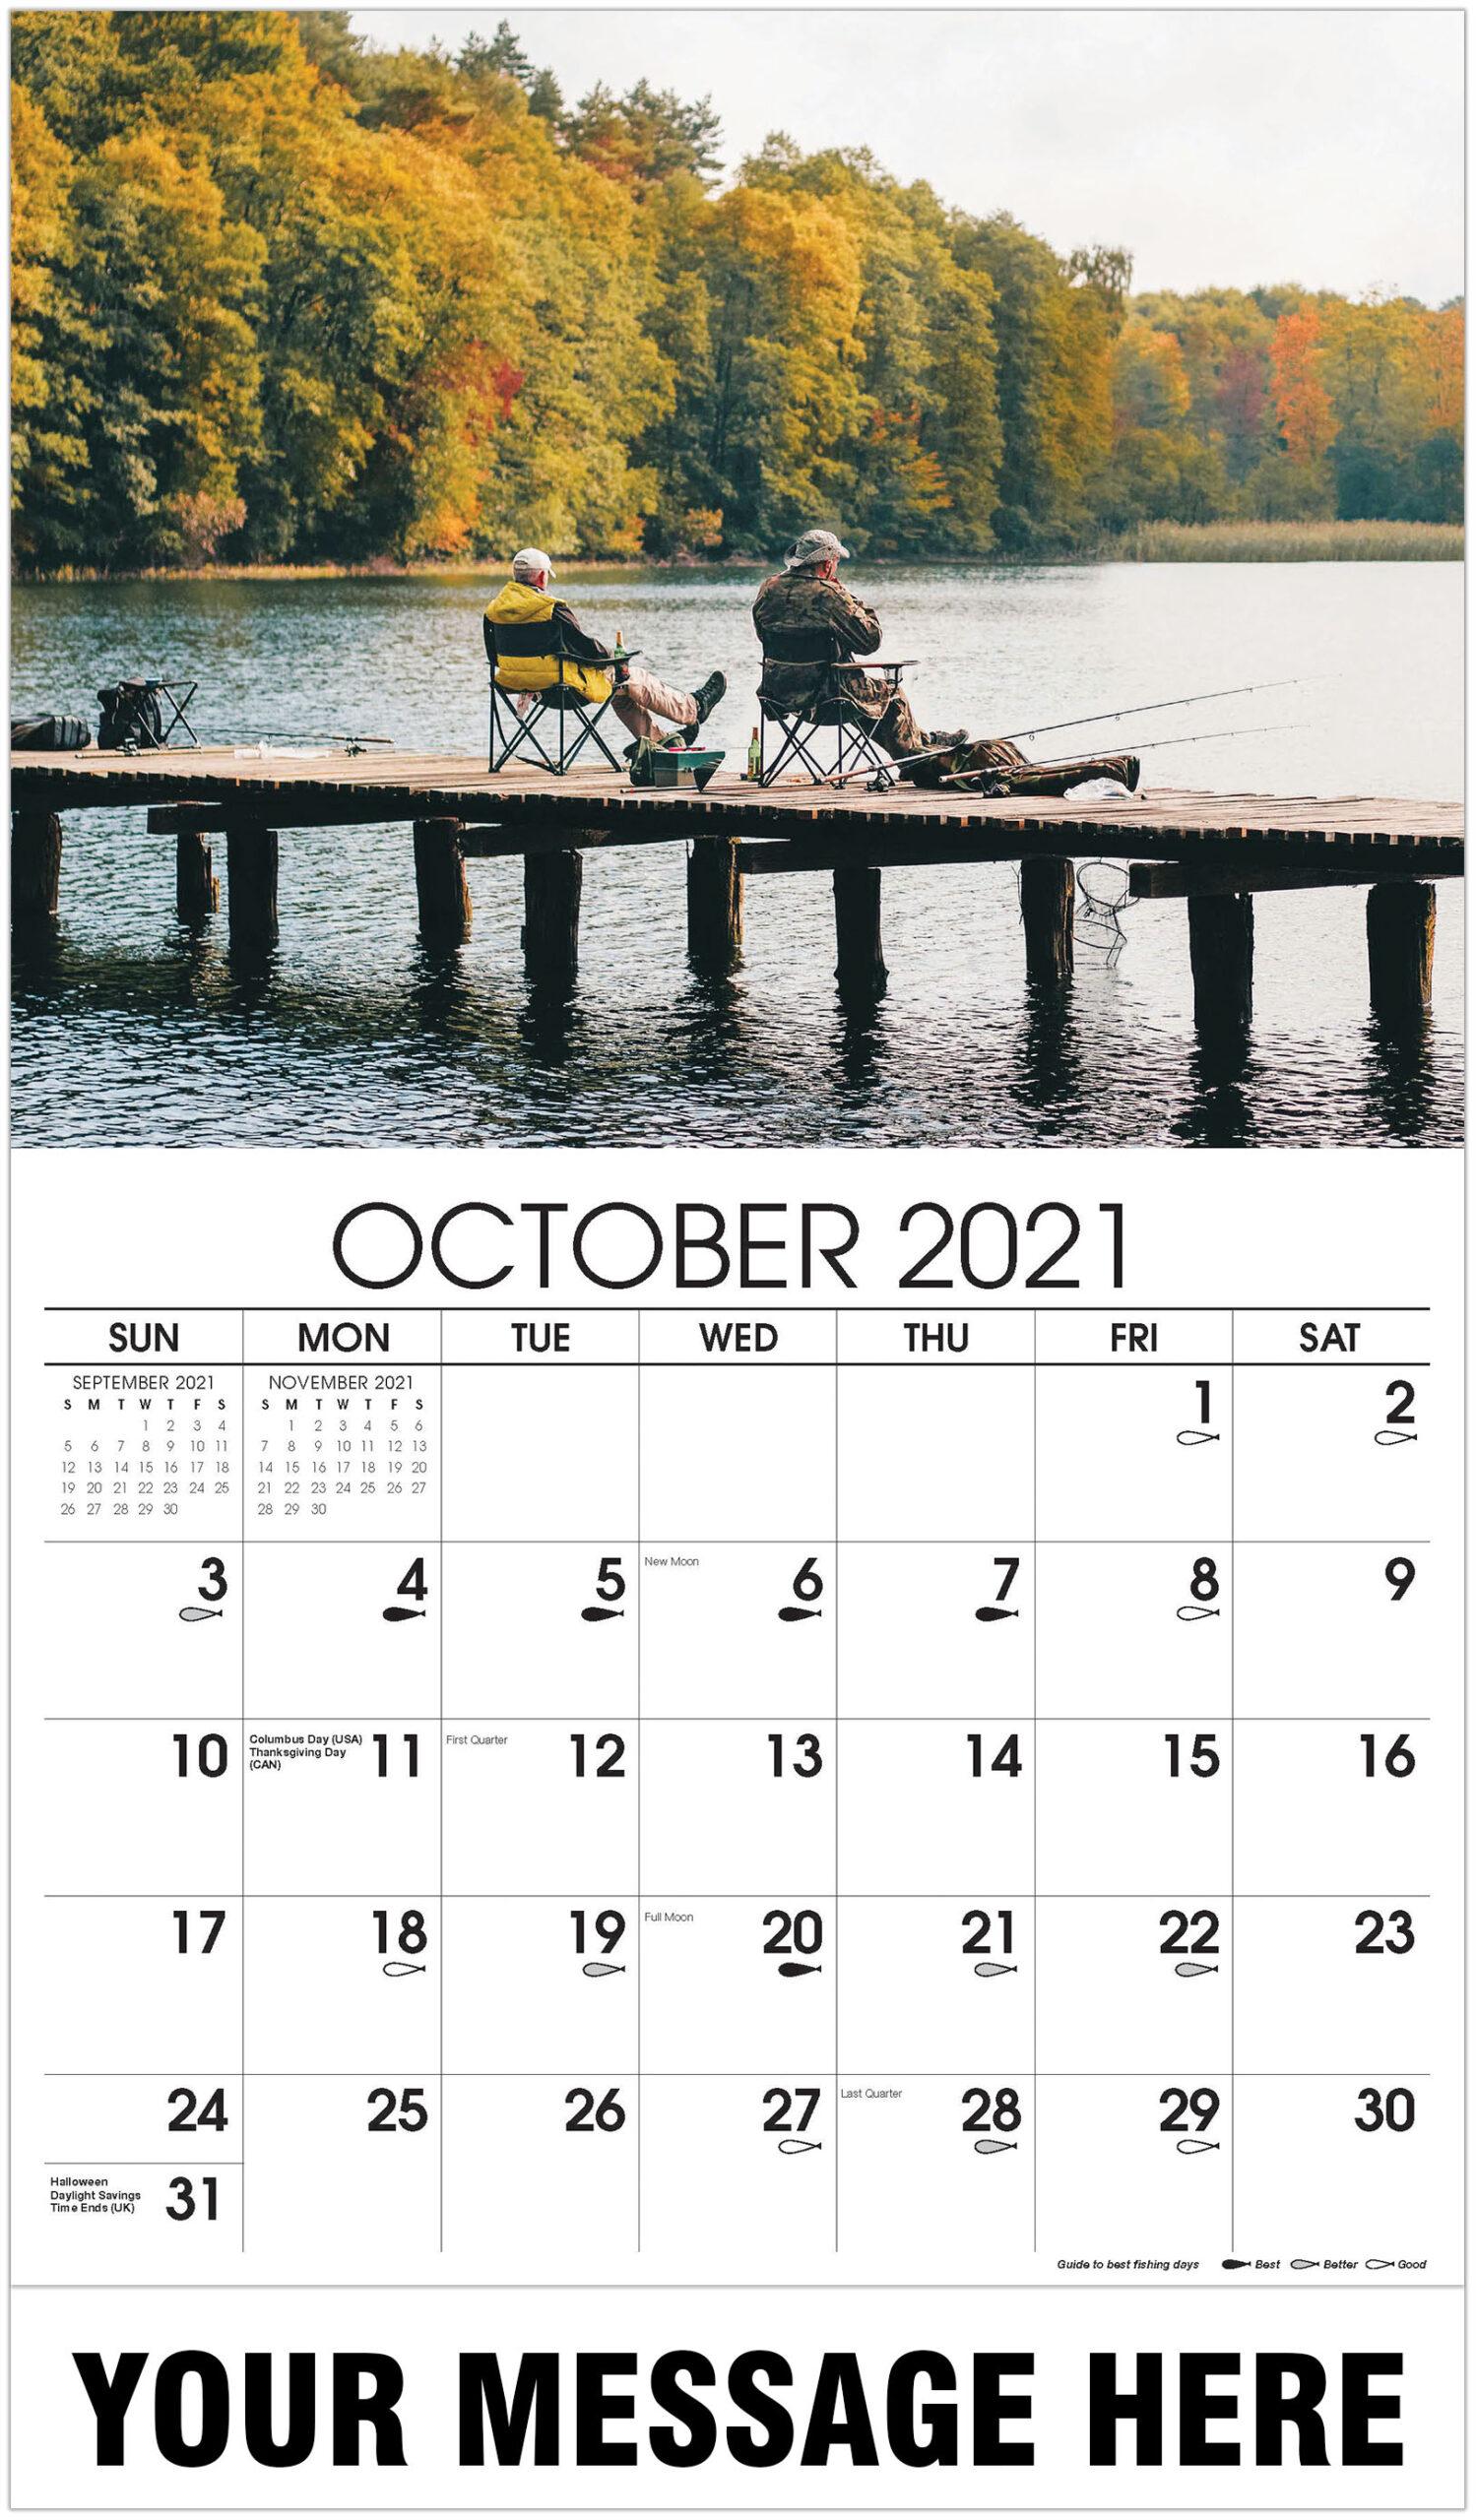 Fishing & Hunting in Hunting Calendar 2021